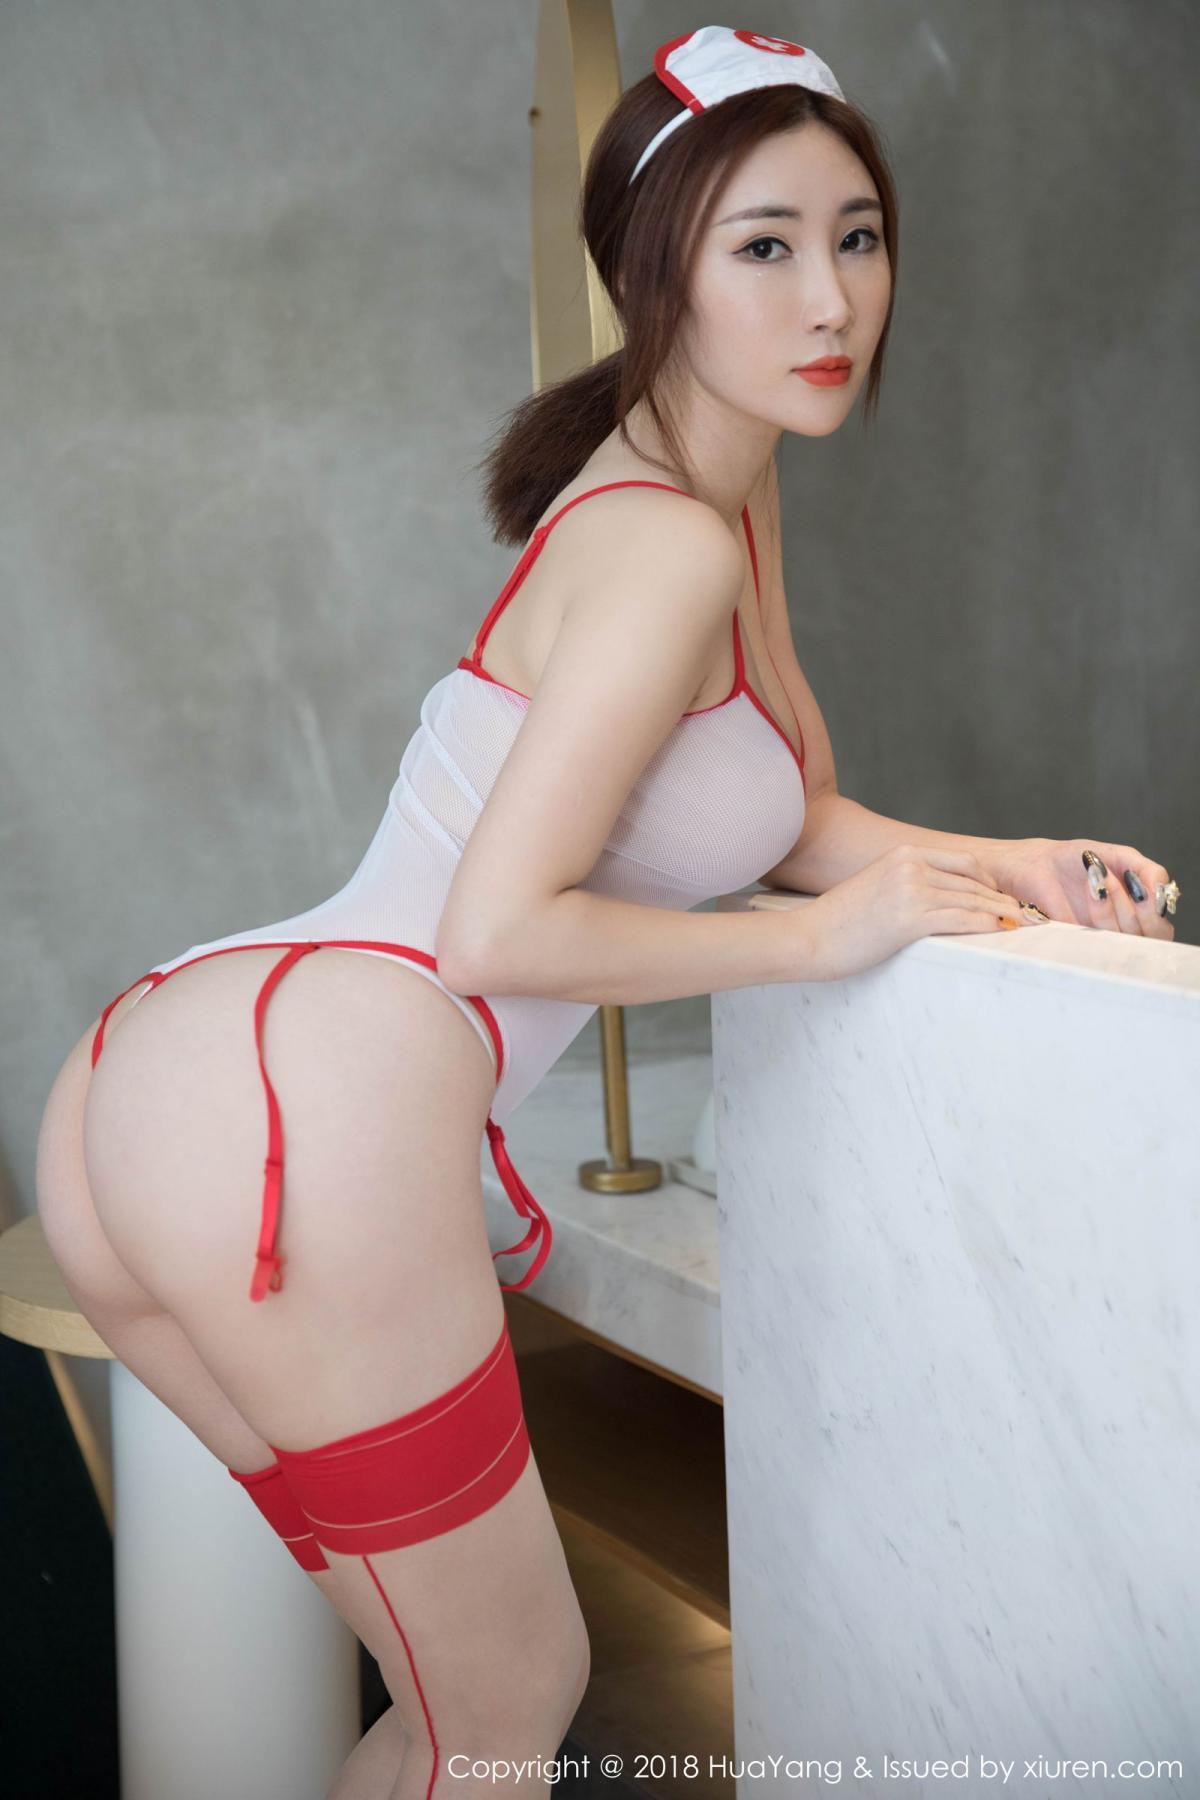 [Huayang] Vol.092 Sun Meng Yao 10P, HuaYang, Nurse, Sun Meng Yao, Tall, Uniform